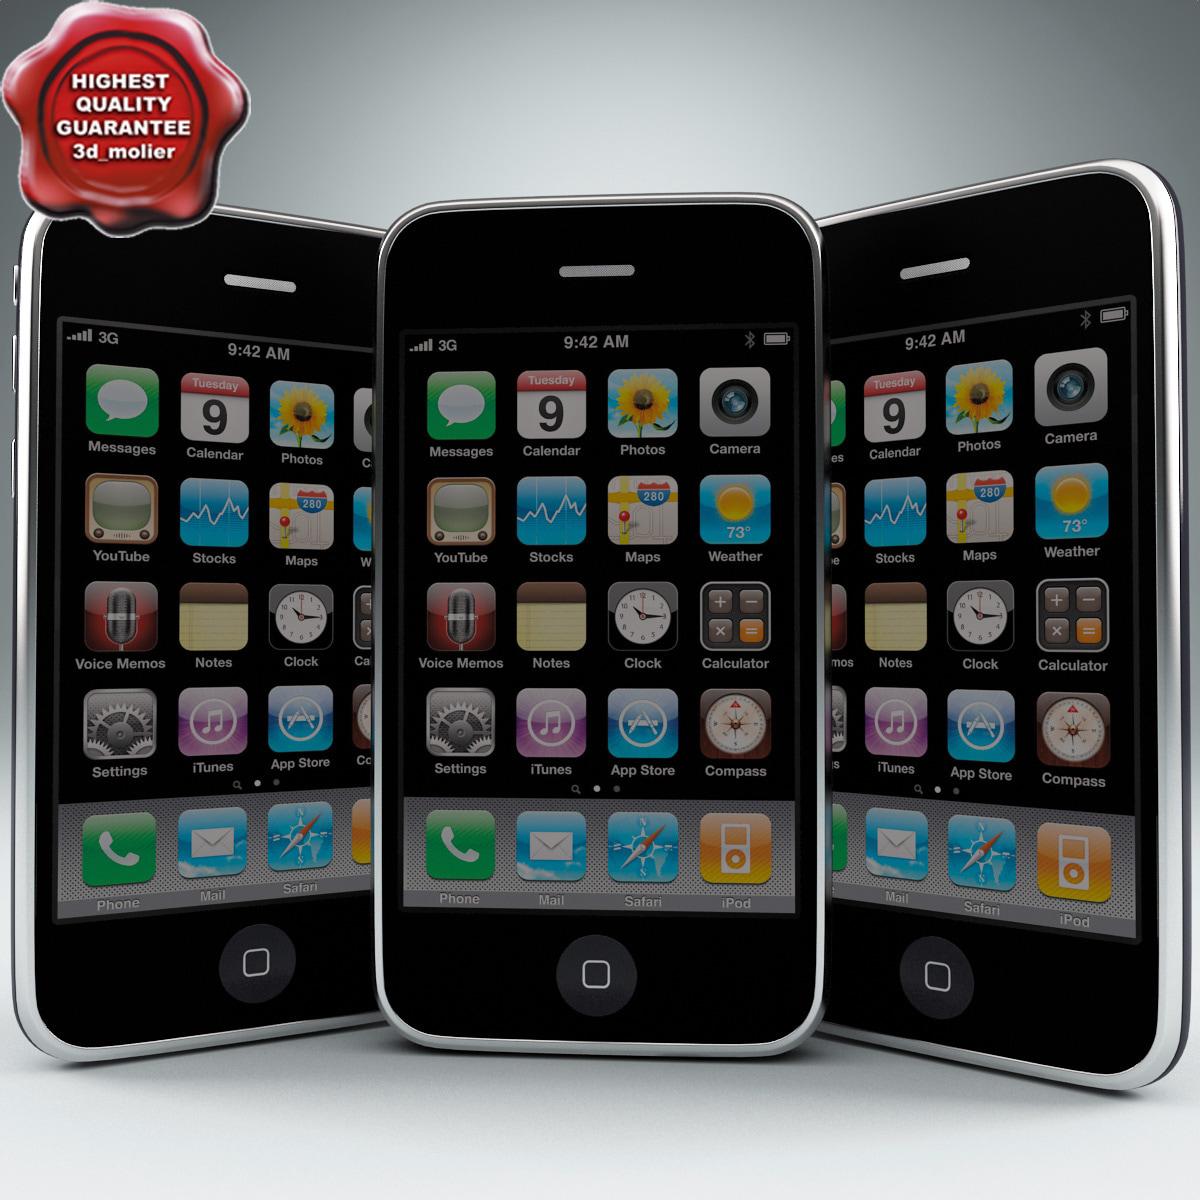 3d model apple iphone 3g 32gb